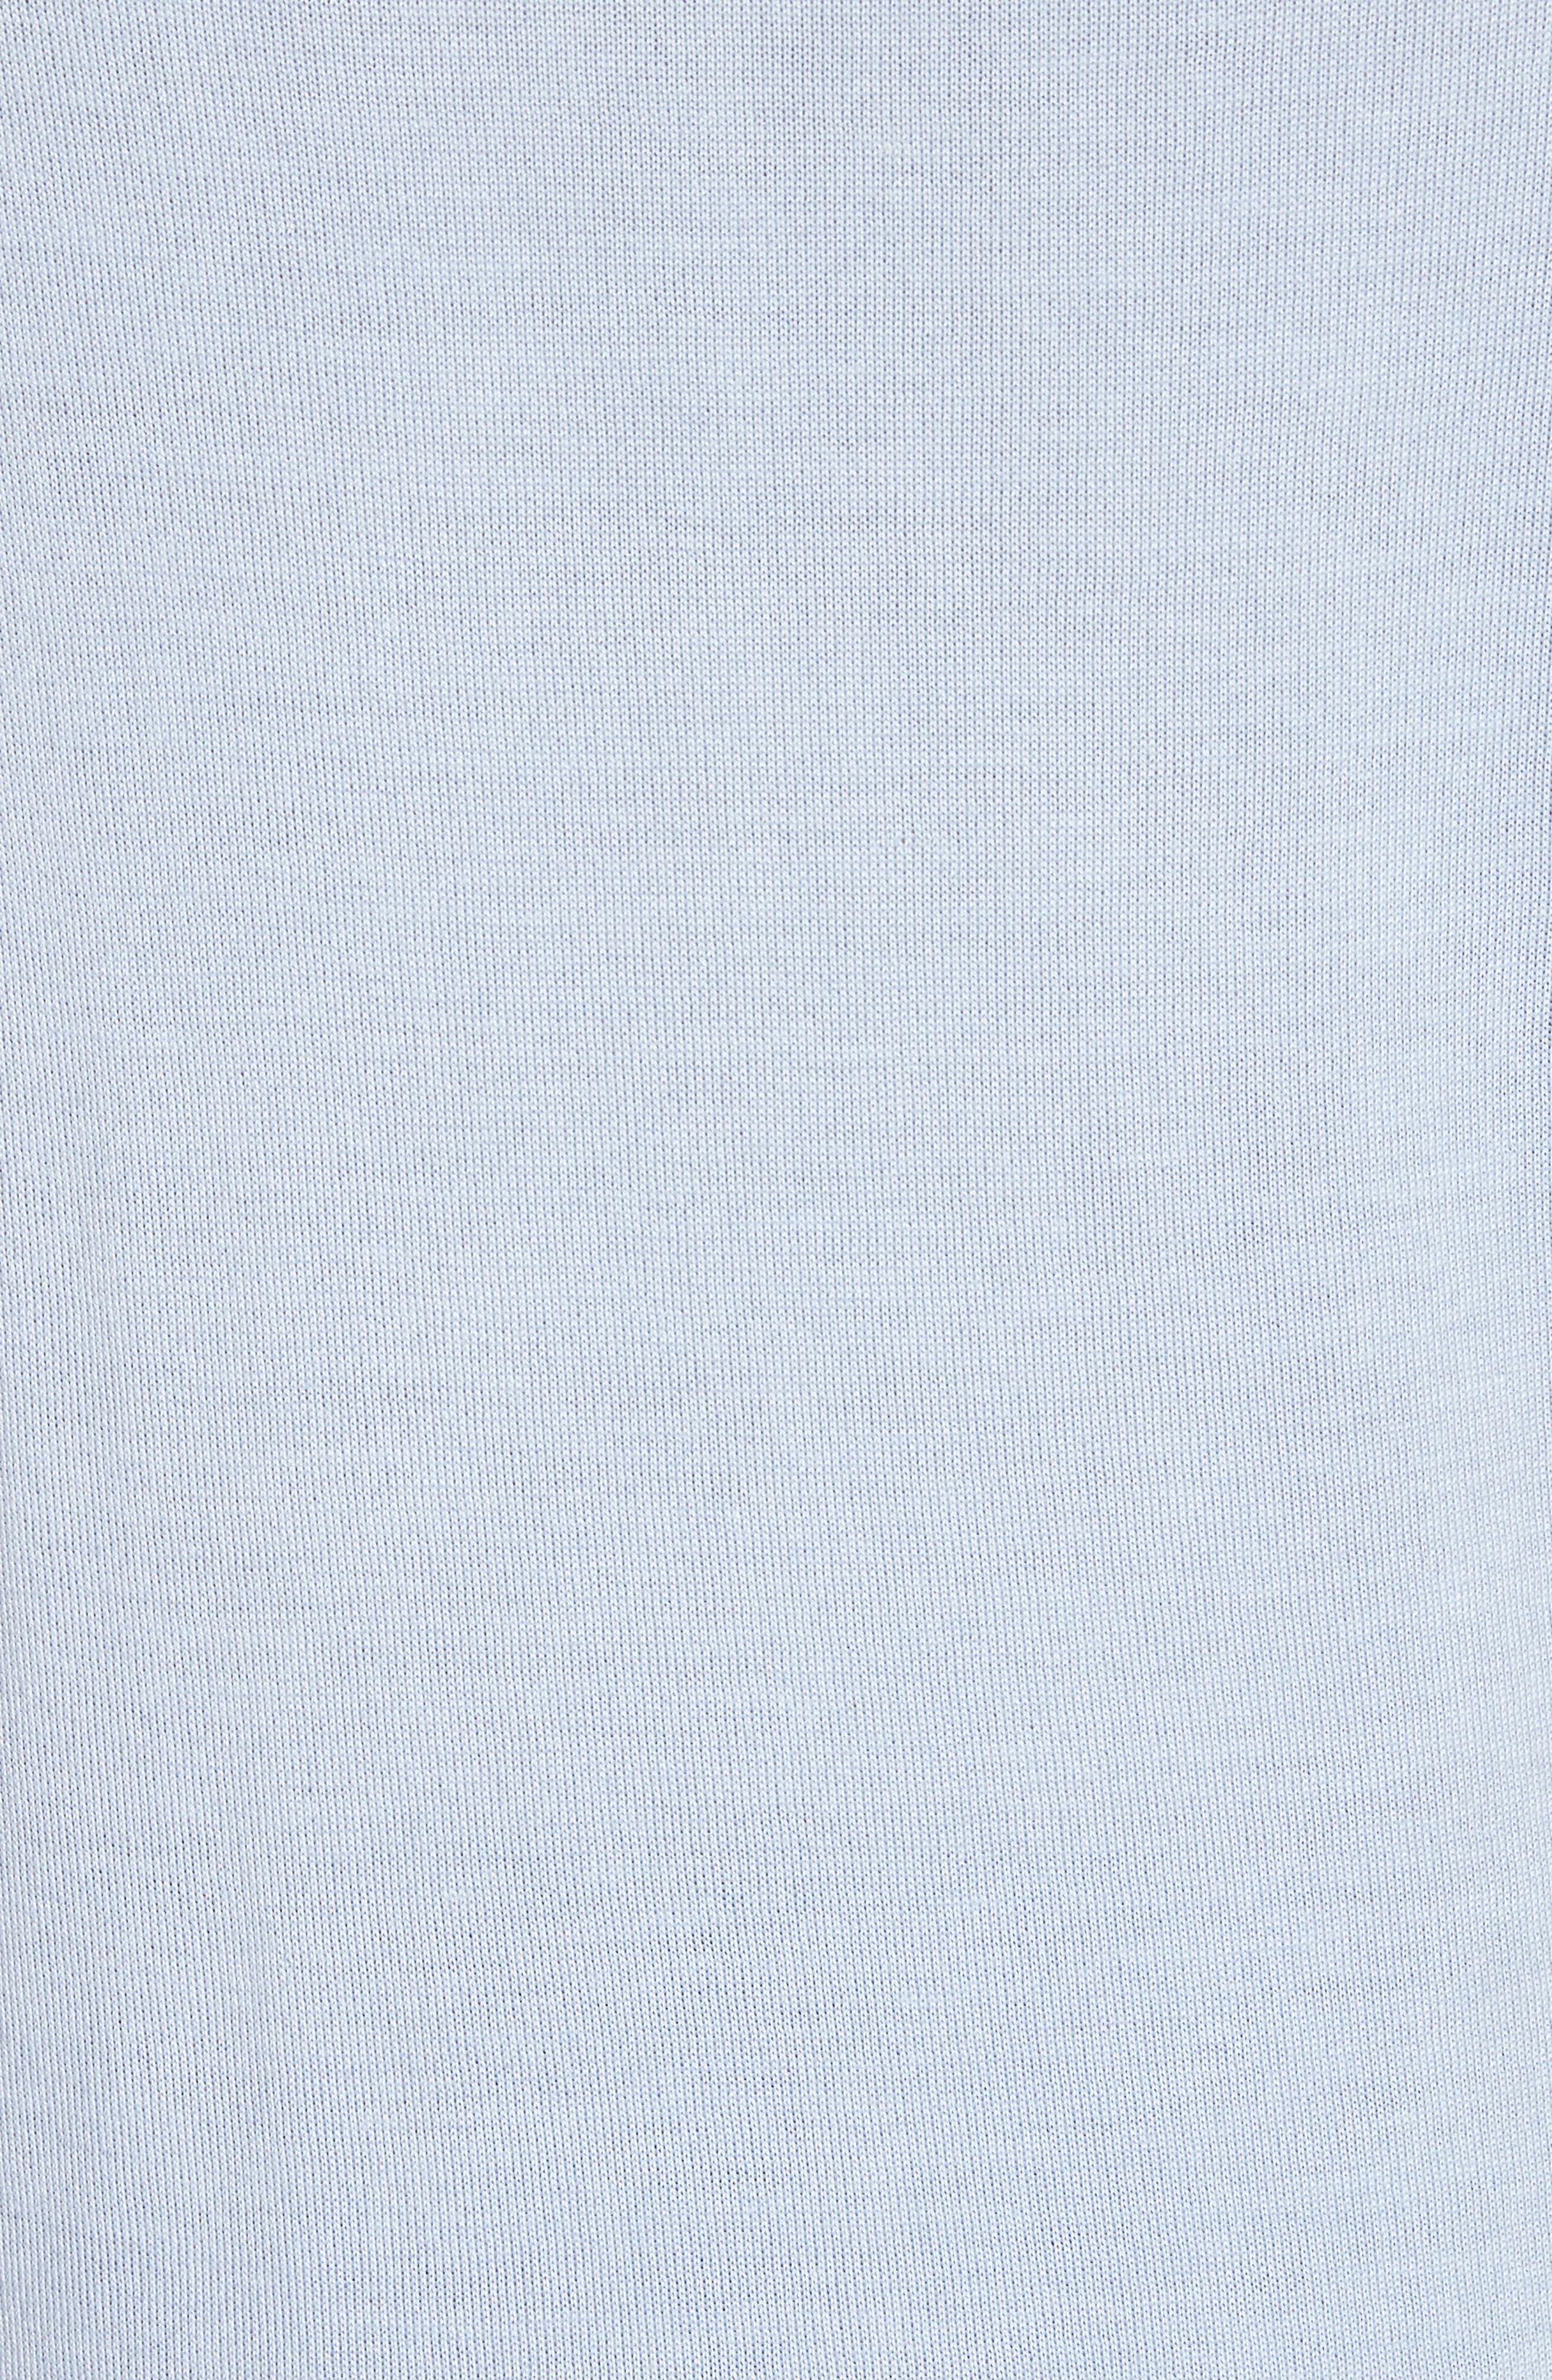 Malad 42 Silk & Cashmere Tee,                             Alternate thumbnail 5, color,                             SKY BLUE